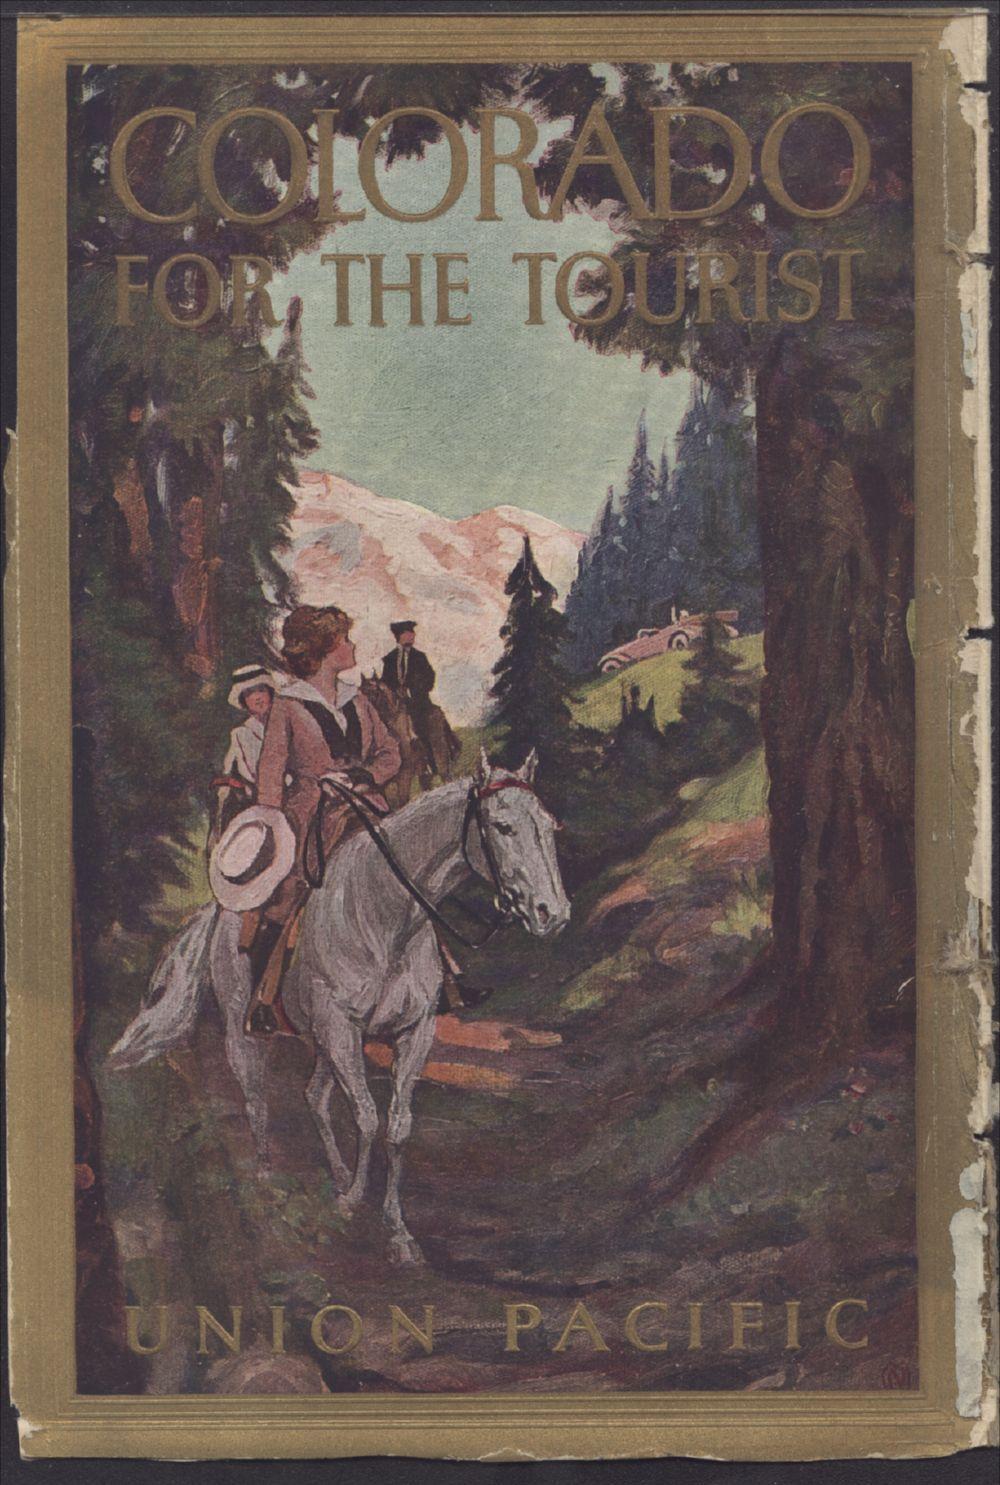 Colorado for the tourist - Back Cover